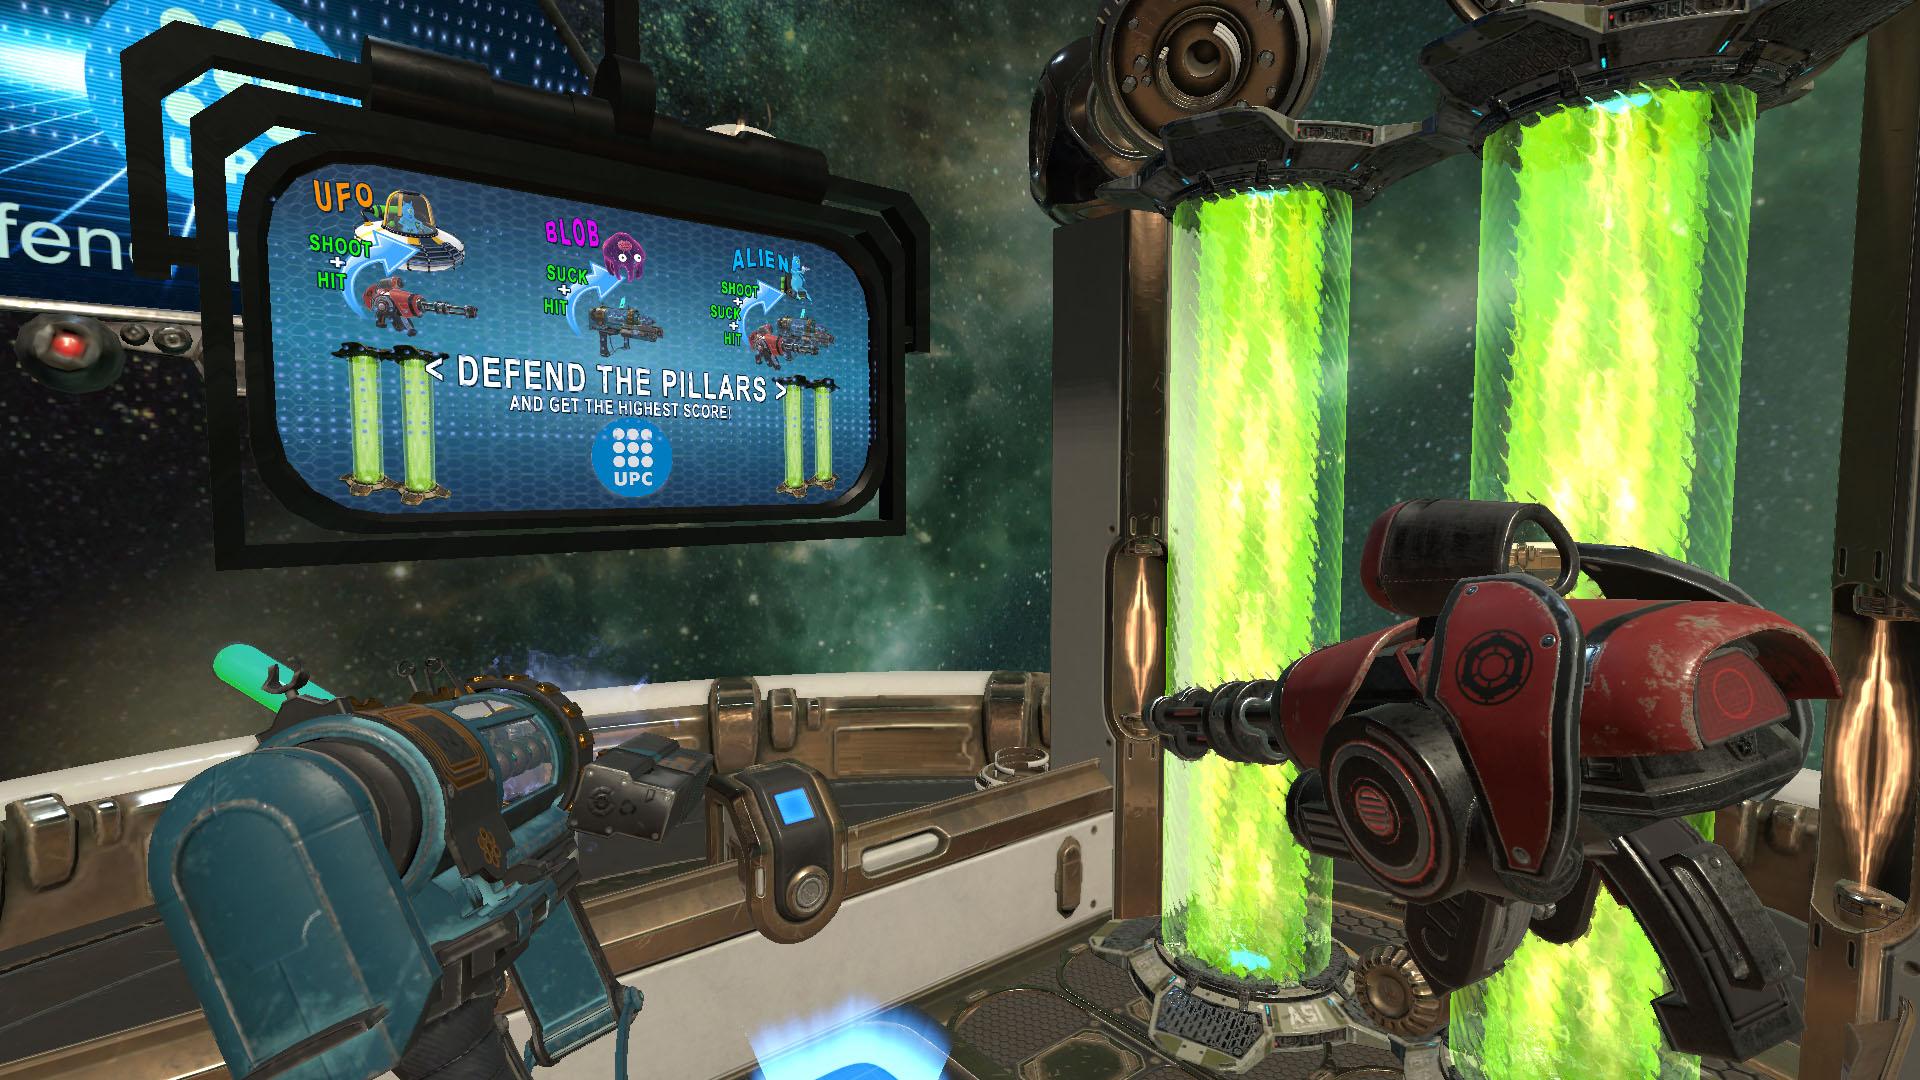 Aliens Attack VR on Steam